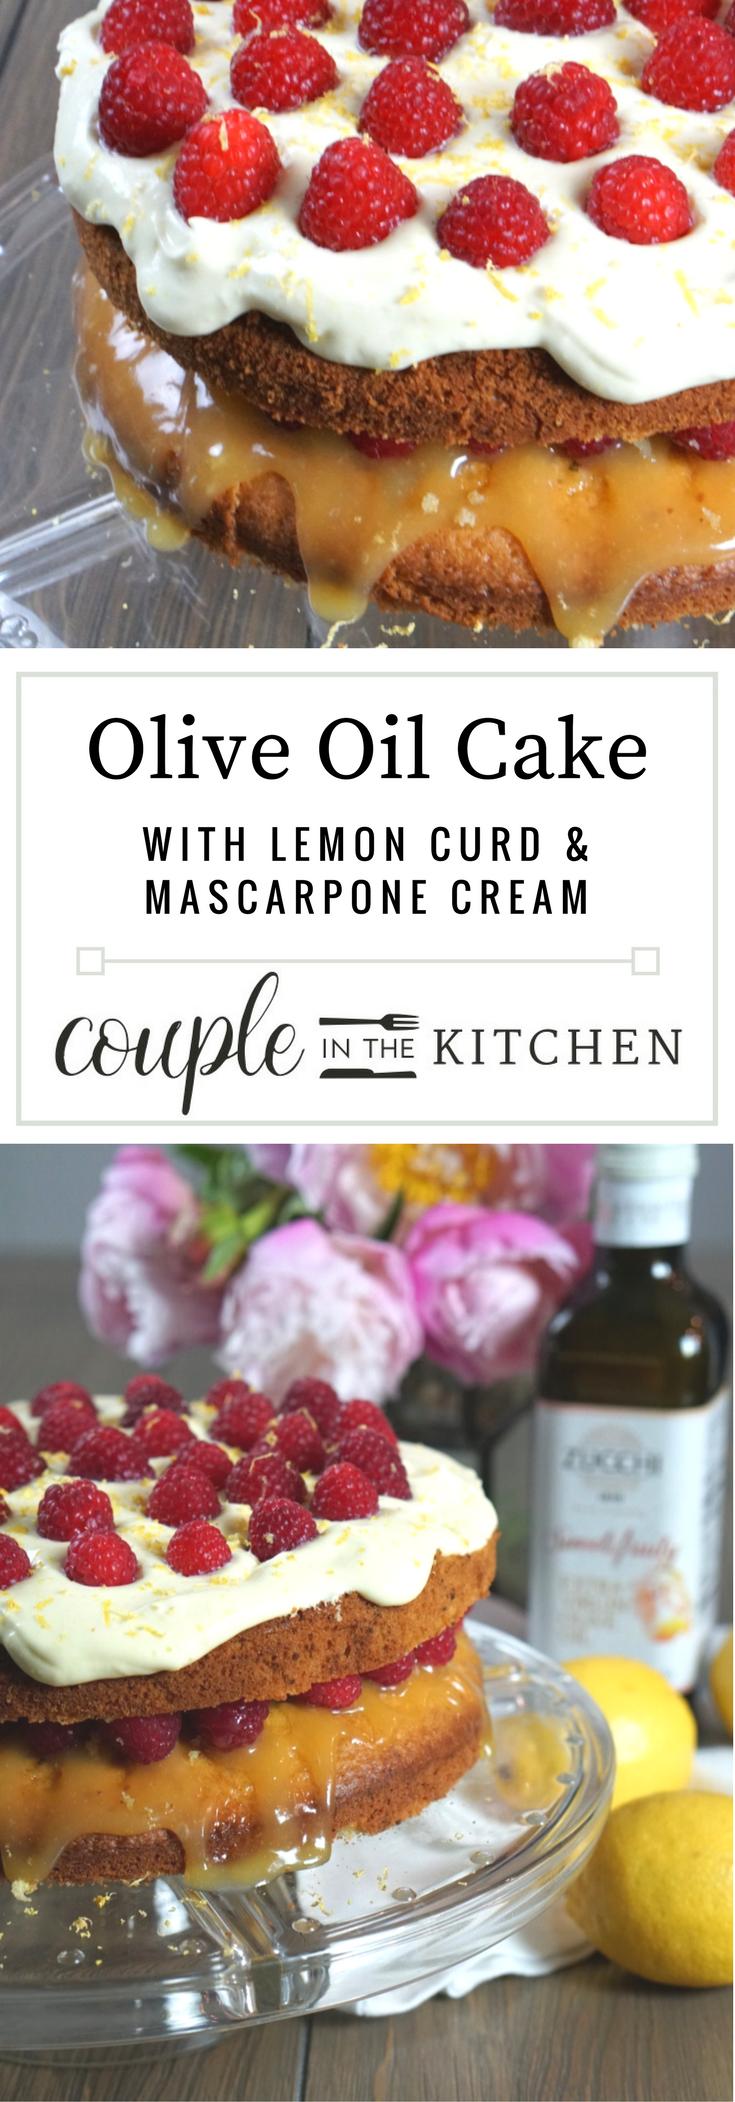 Lemon Olive Oil Cake with Lemon Curd, Raspberries, and Mascarpone Lemon Cream | coupleinthekitchen,com